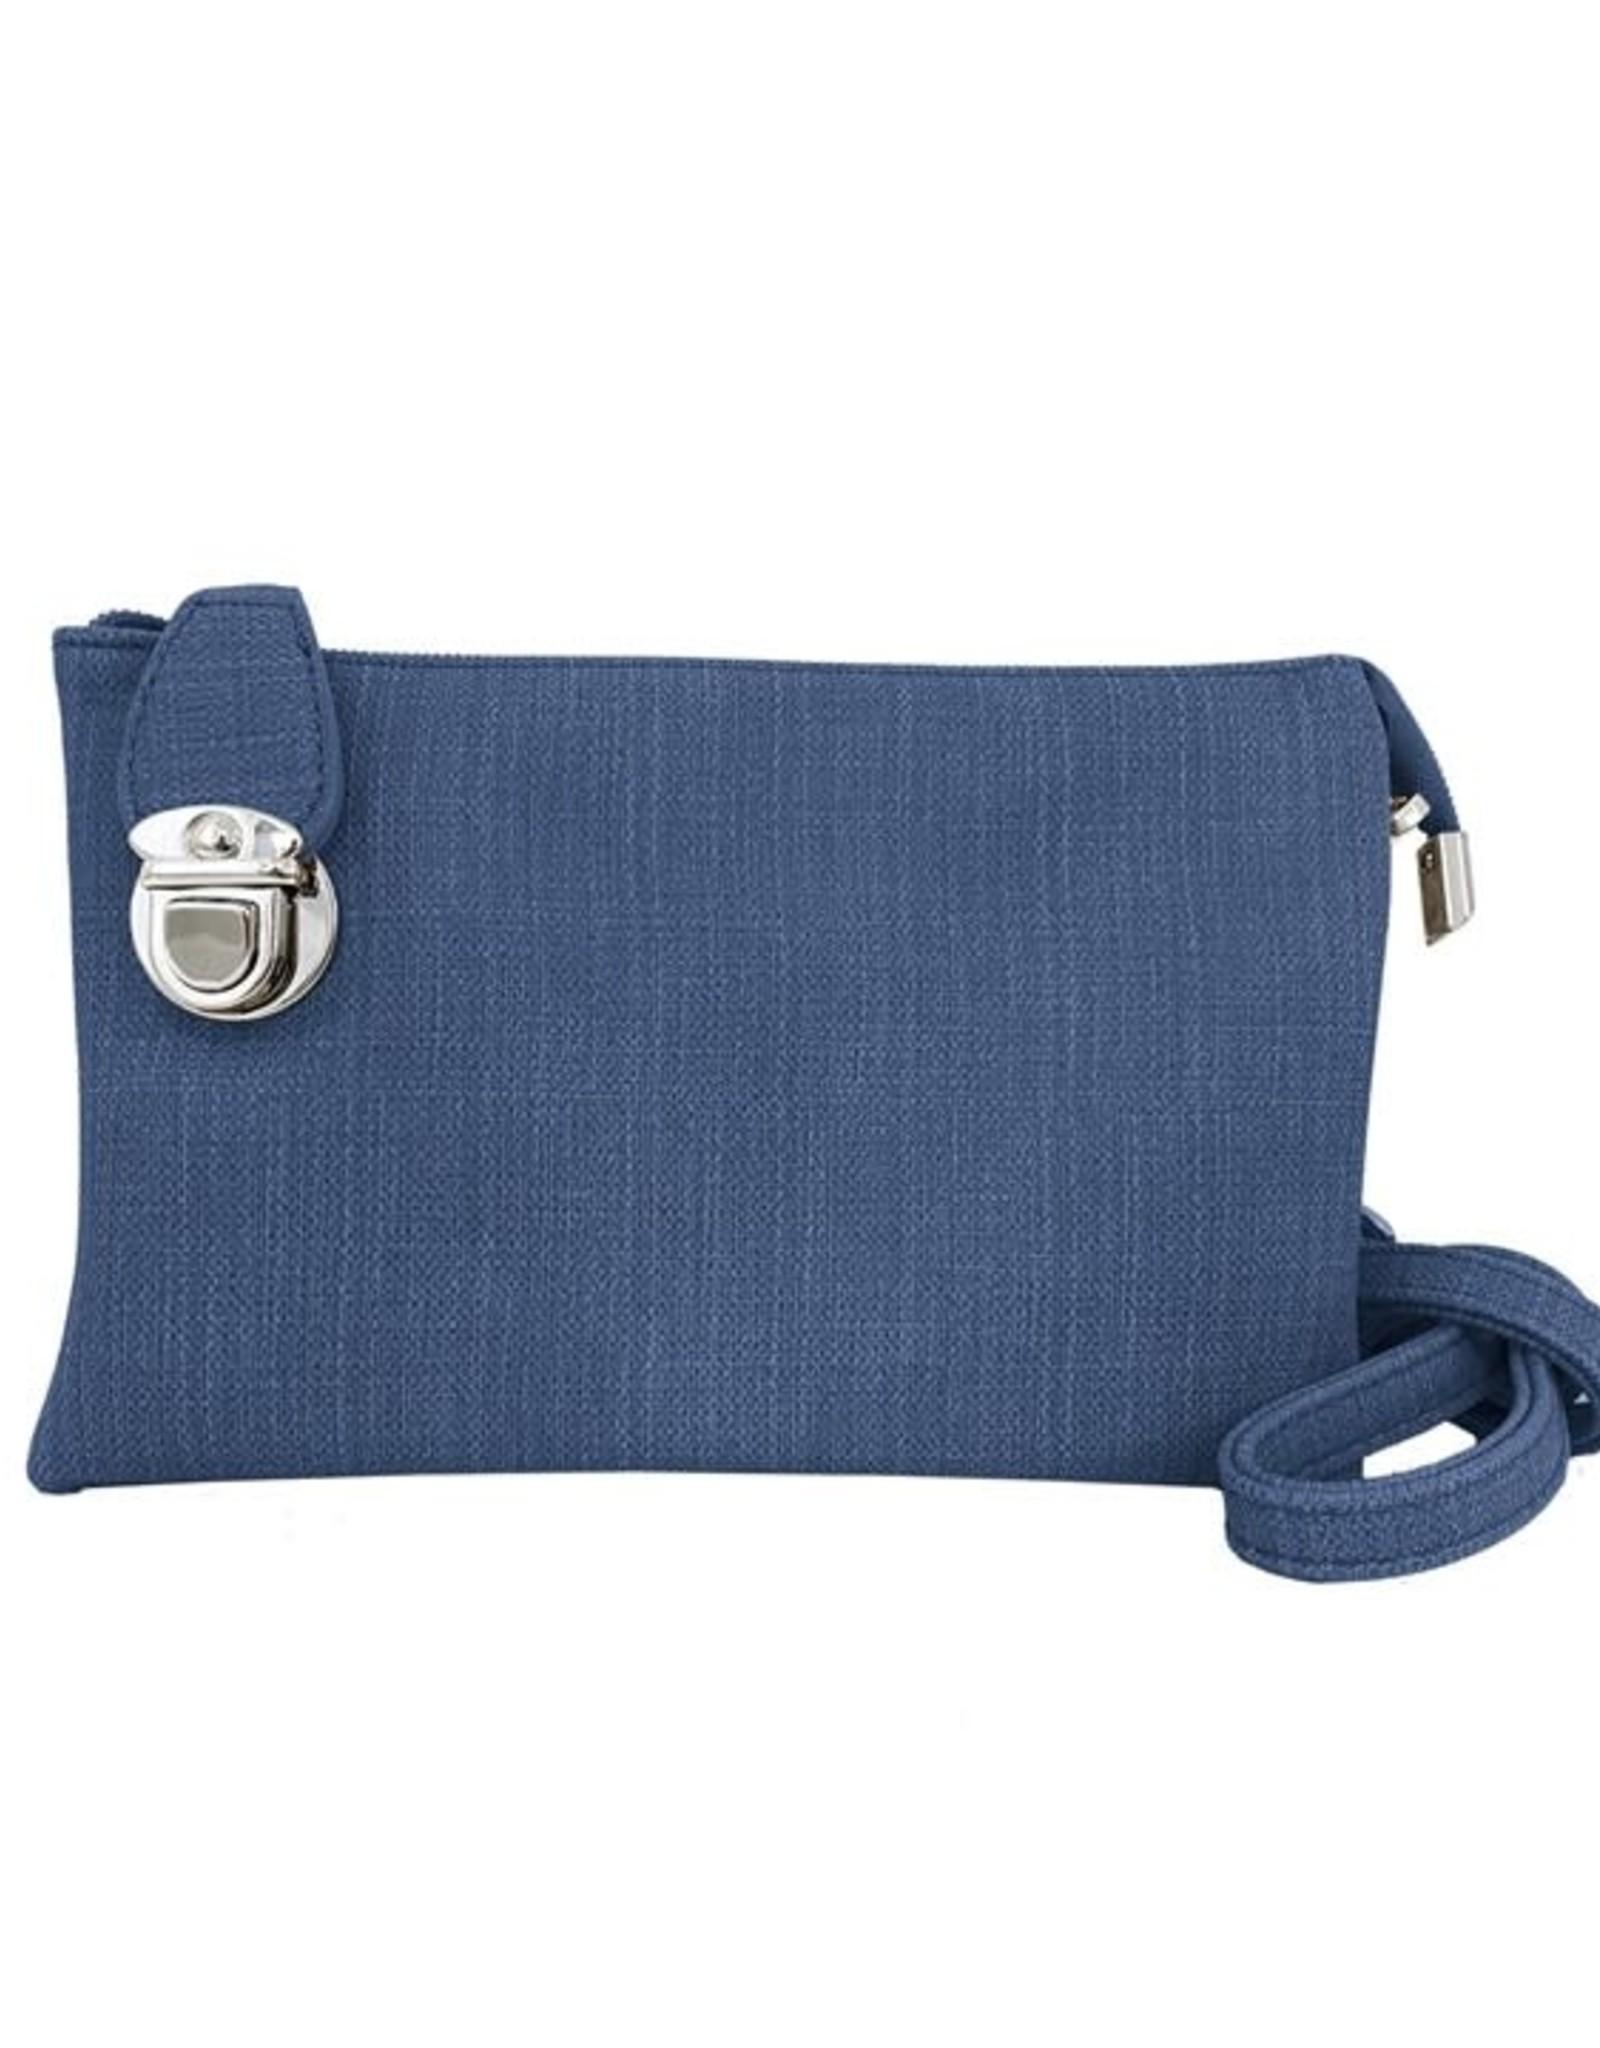 Caracol Petit sac - Marine #7011